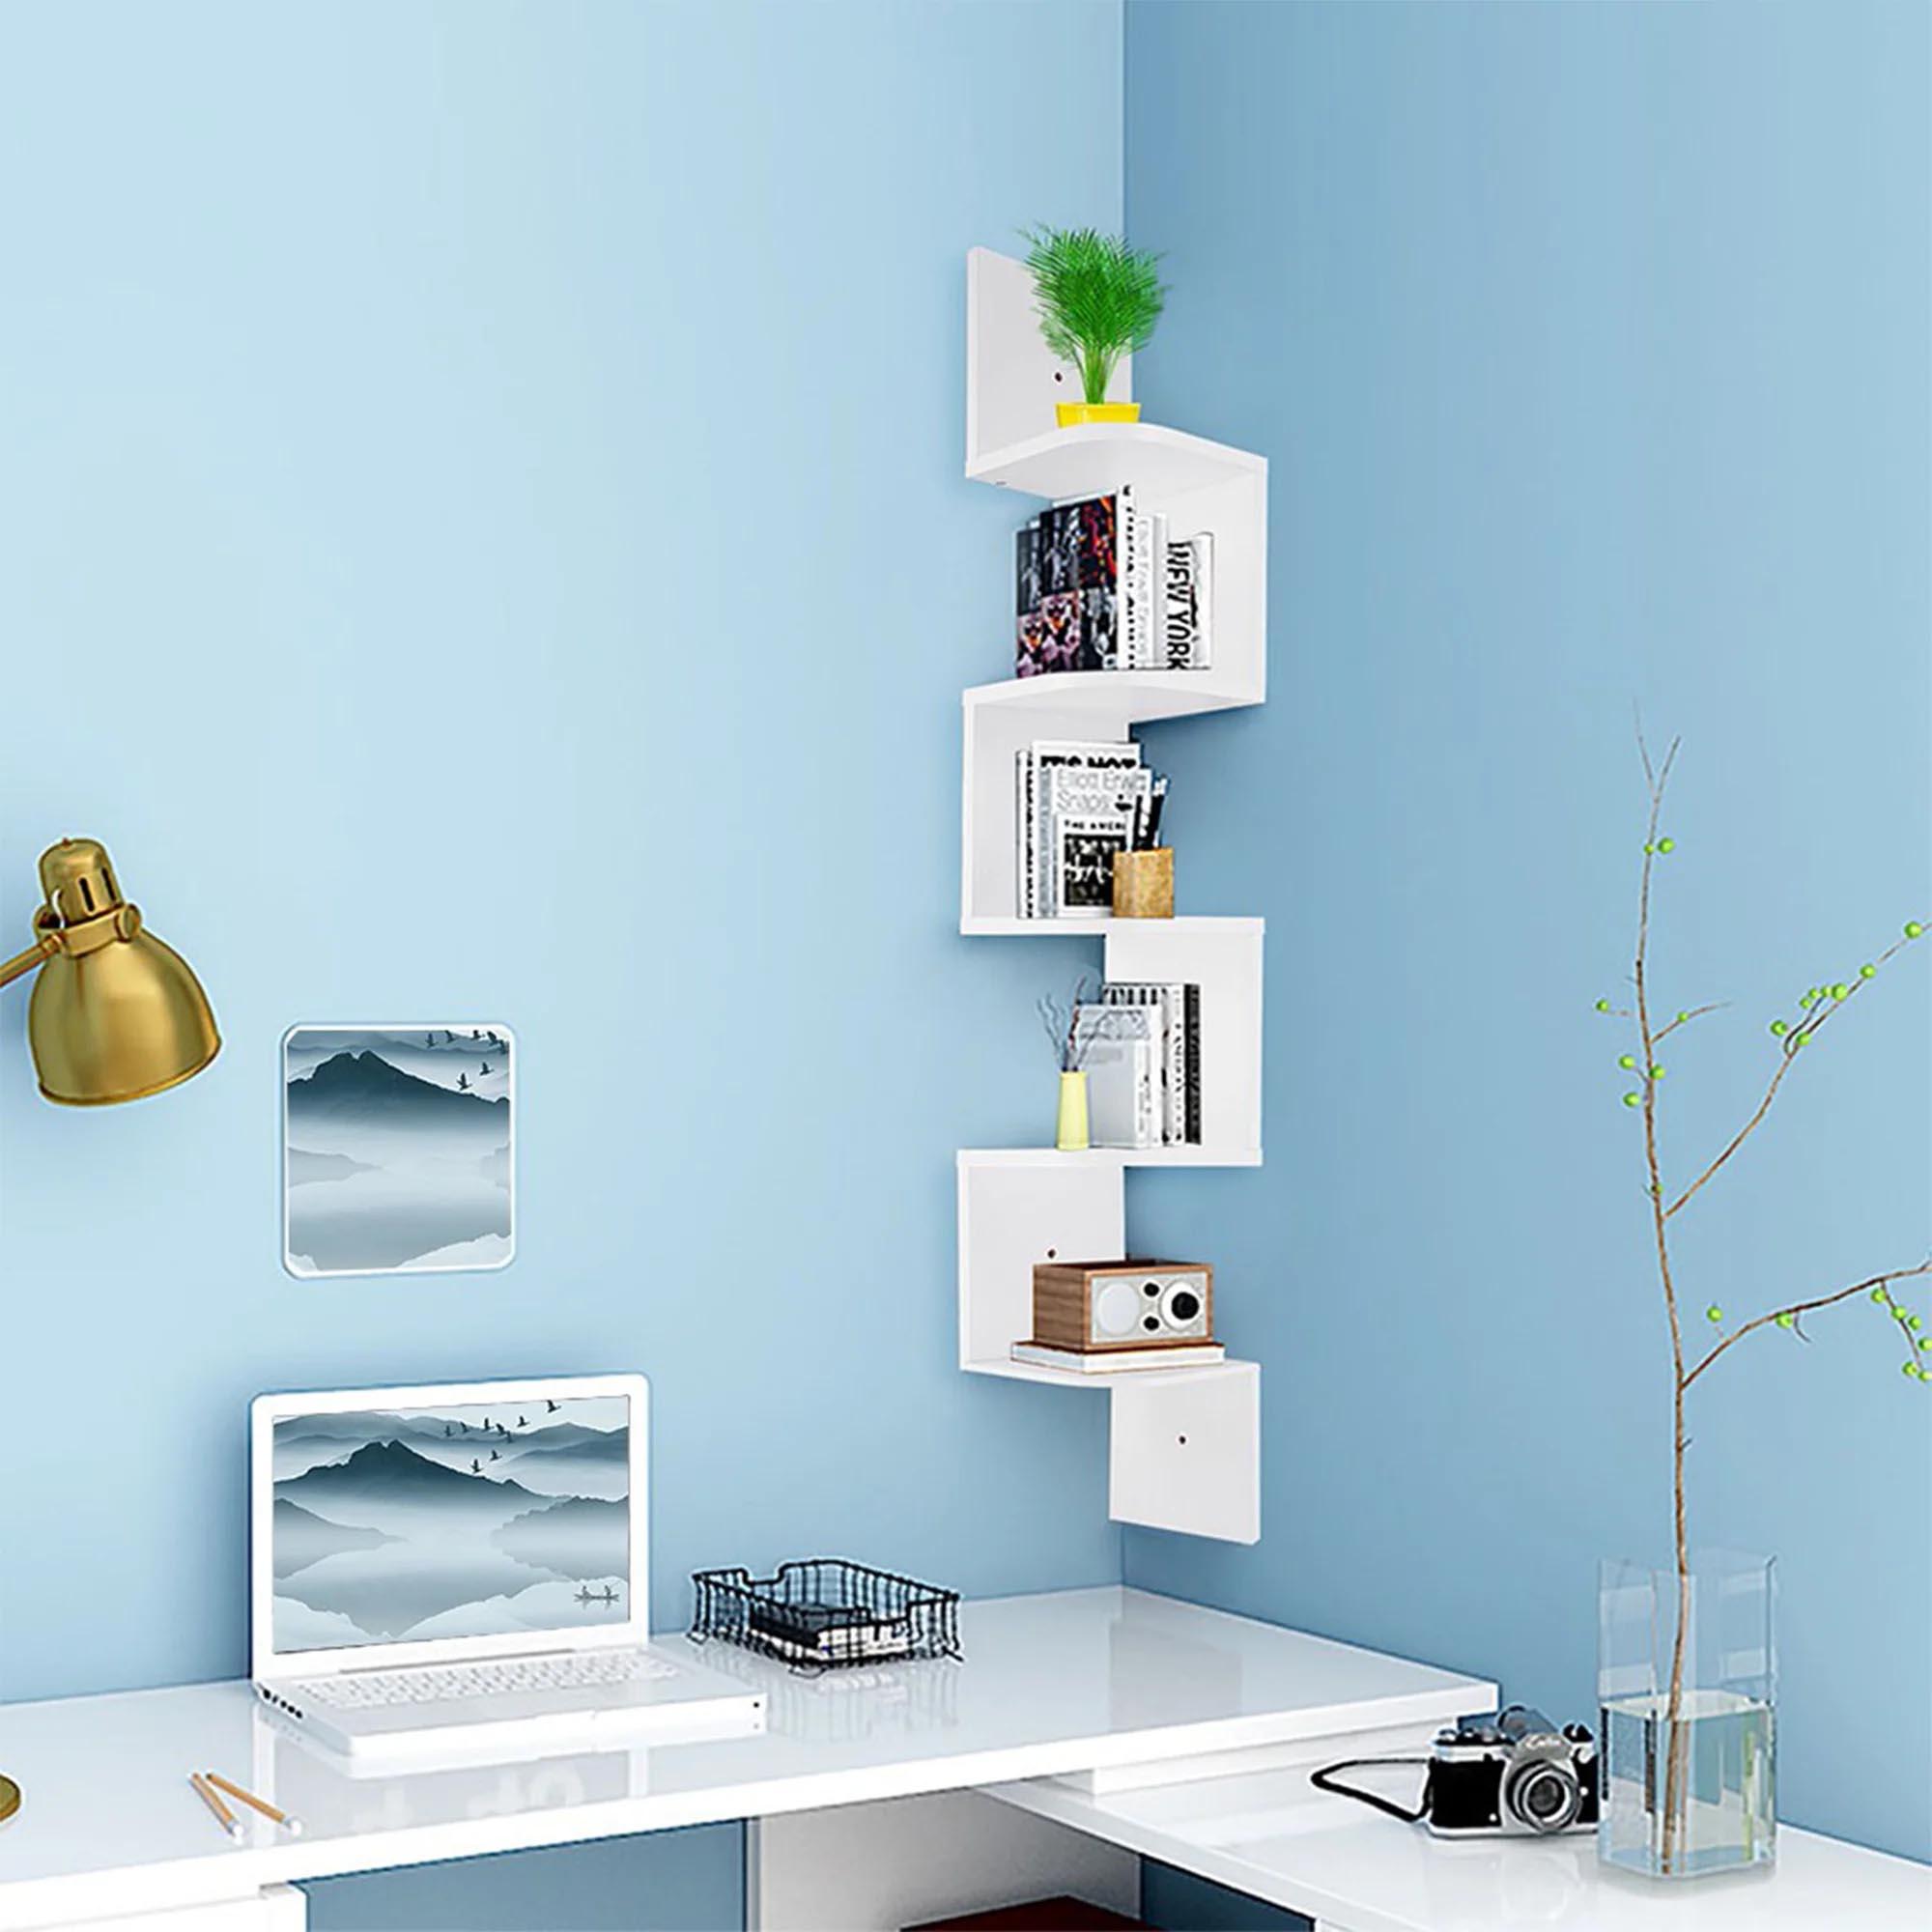 Corner Shelf Ideas - A white 5-tier wall mounted shelf.